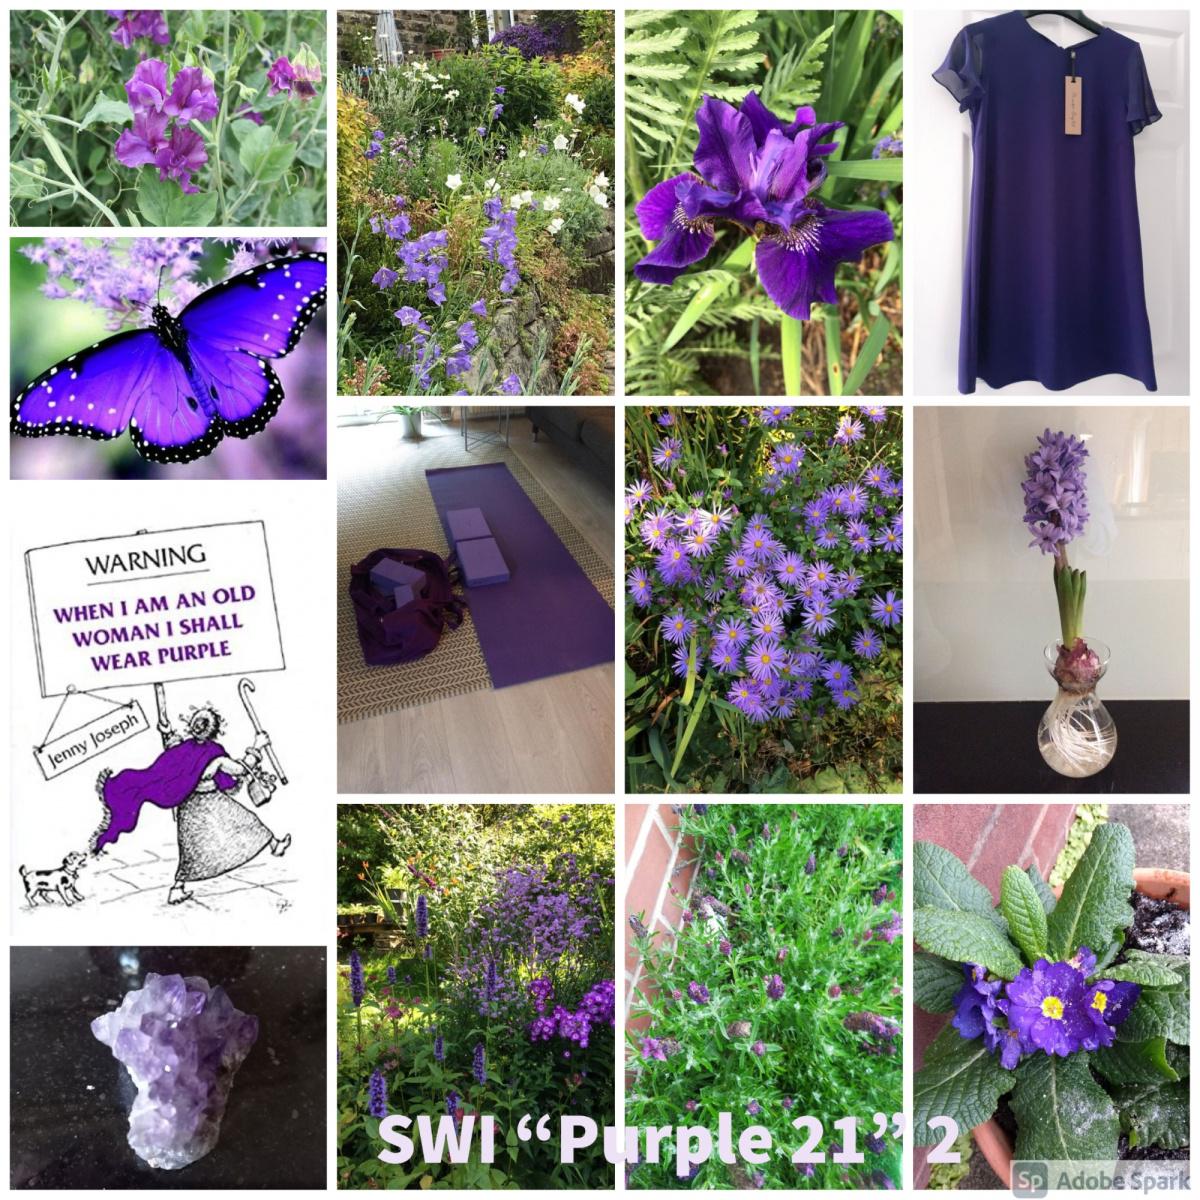 SWI-Purple-21-part2